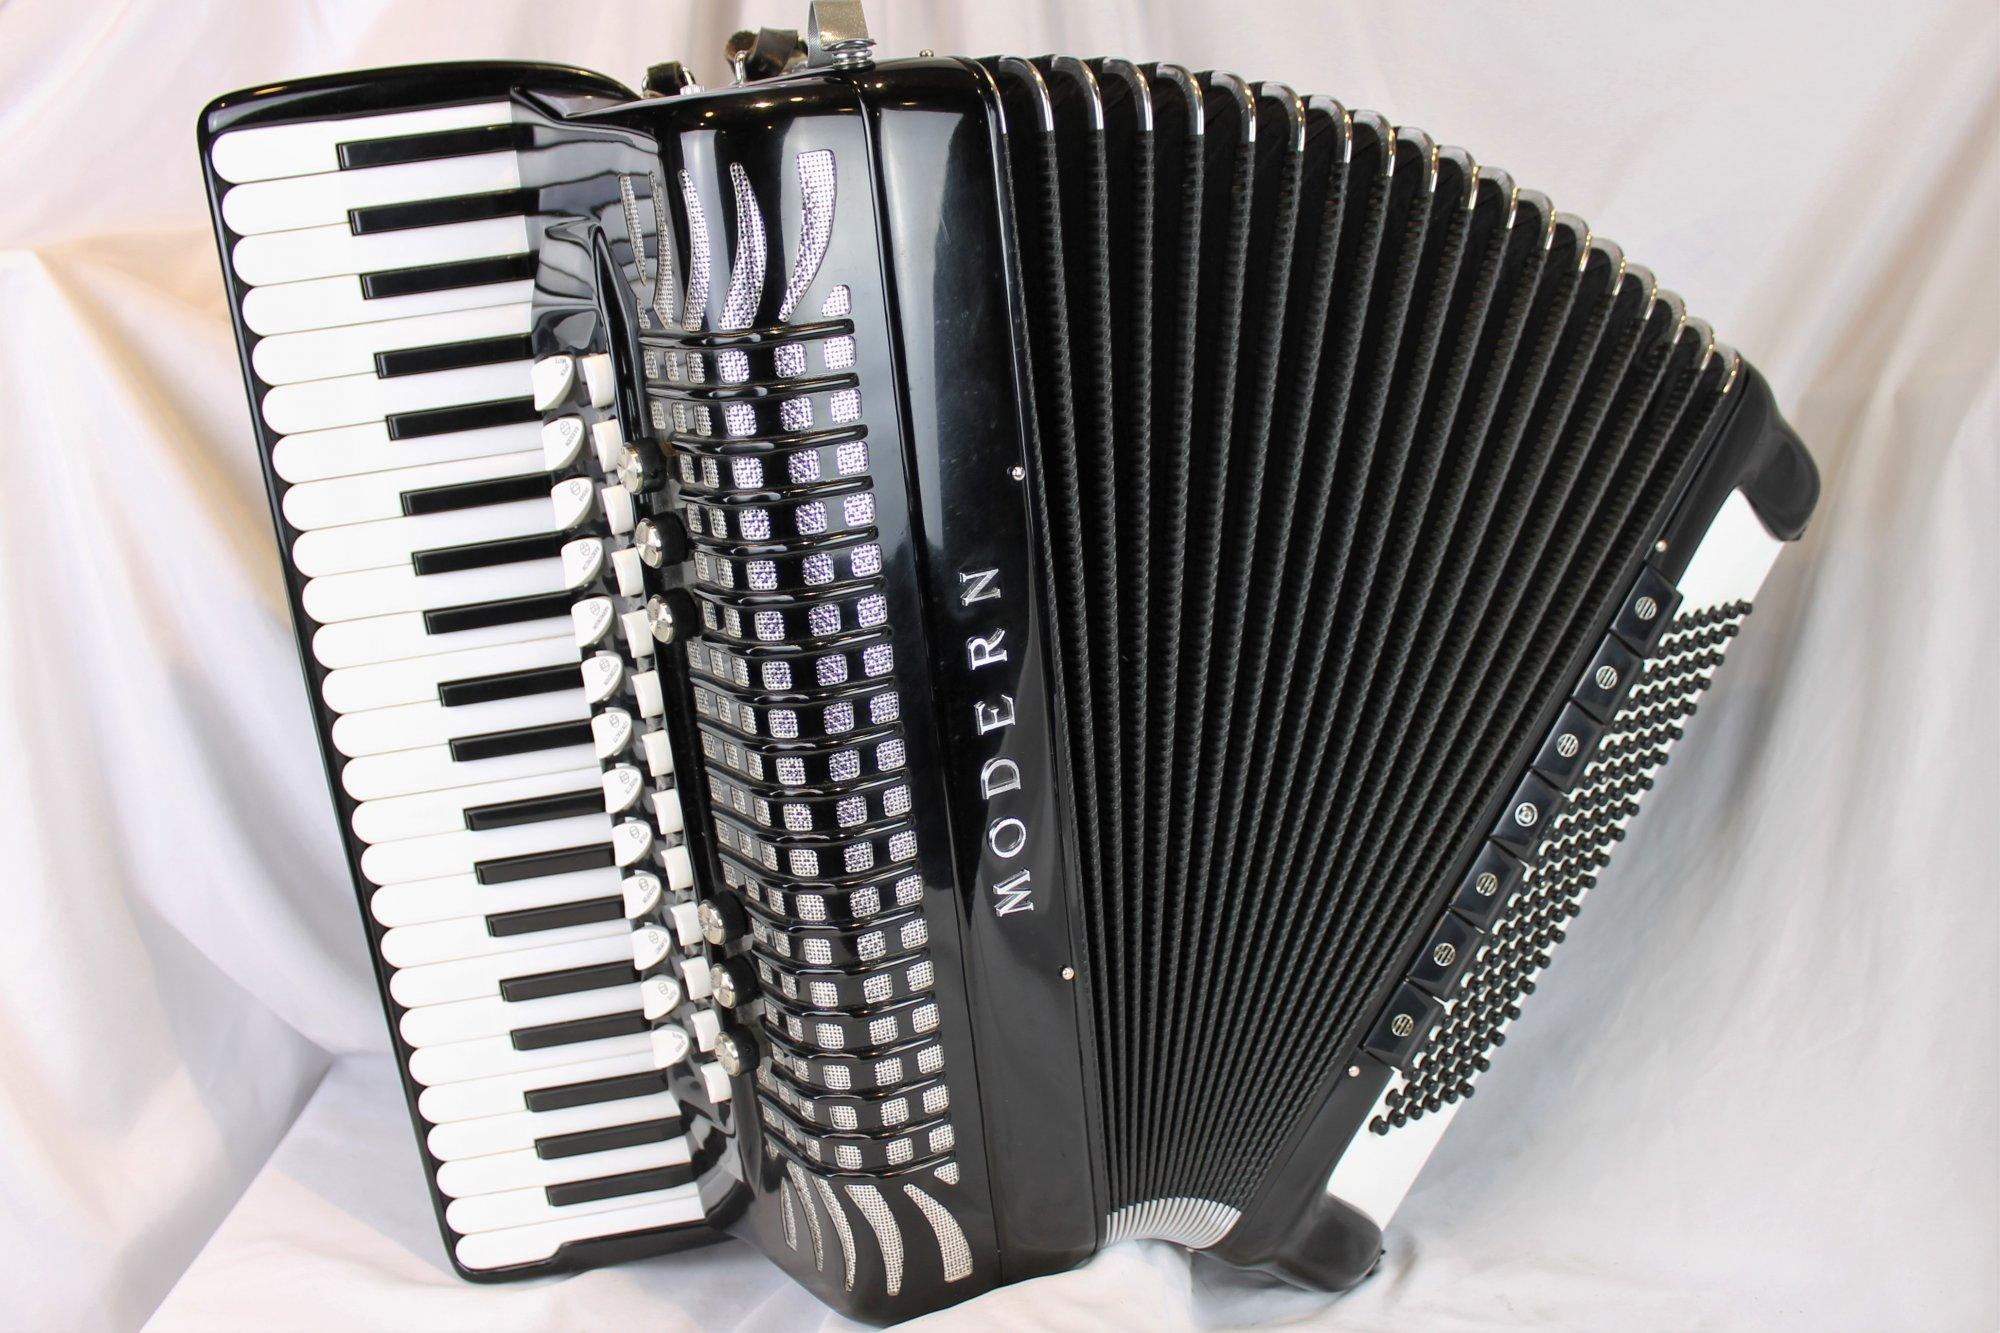 4859 - Black Borsini Modern Piano Accordion LMMM 44 120